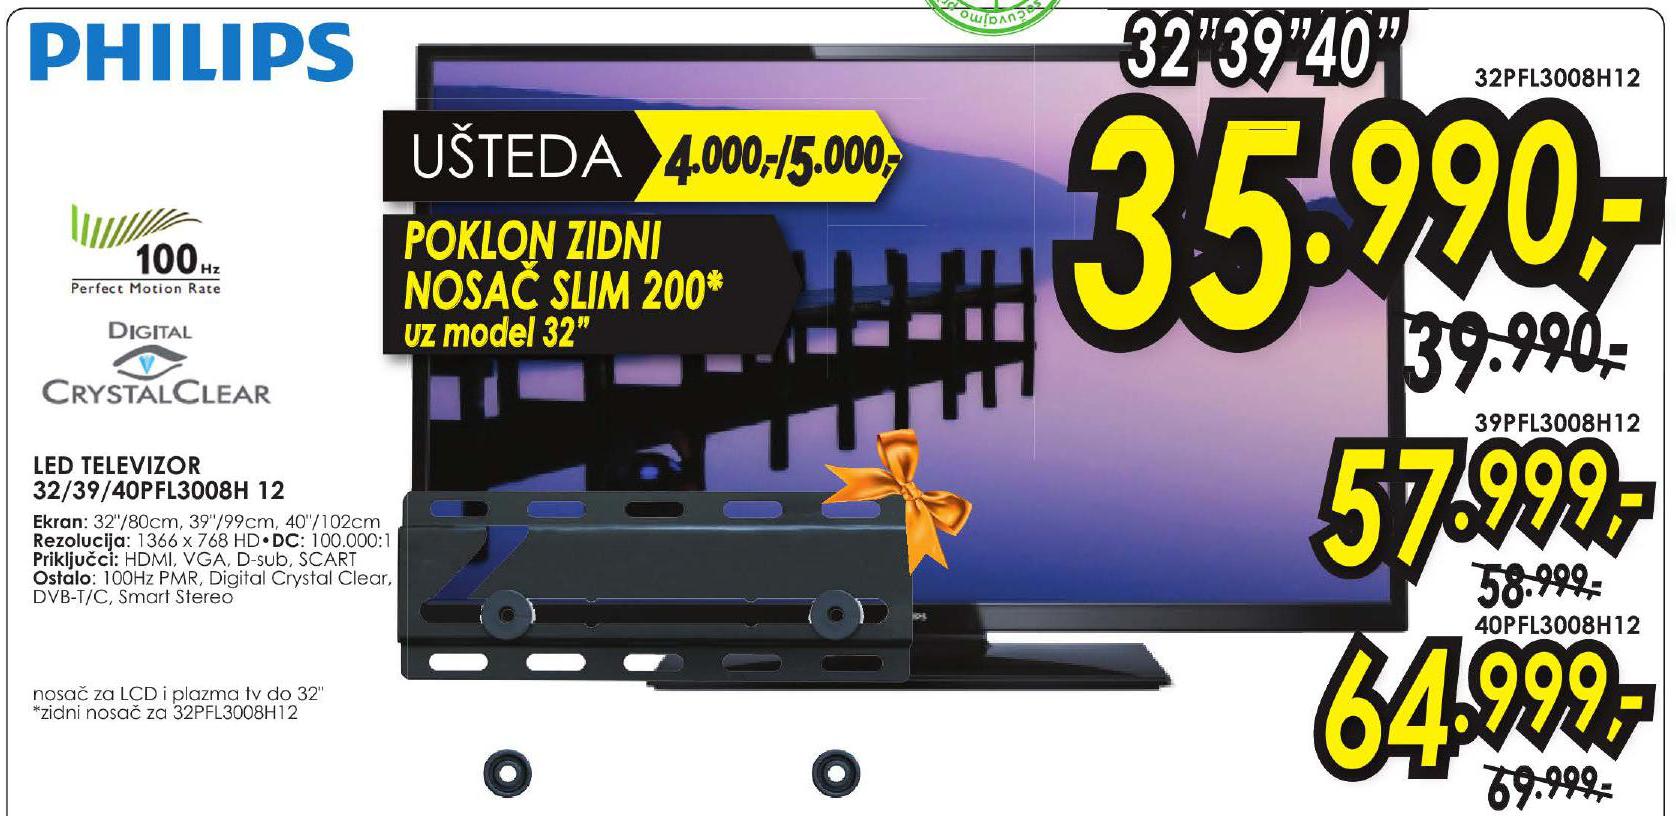 LED Televizor 40FL3008H 12